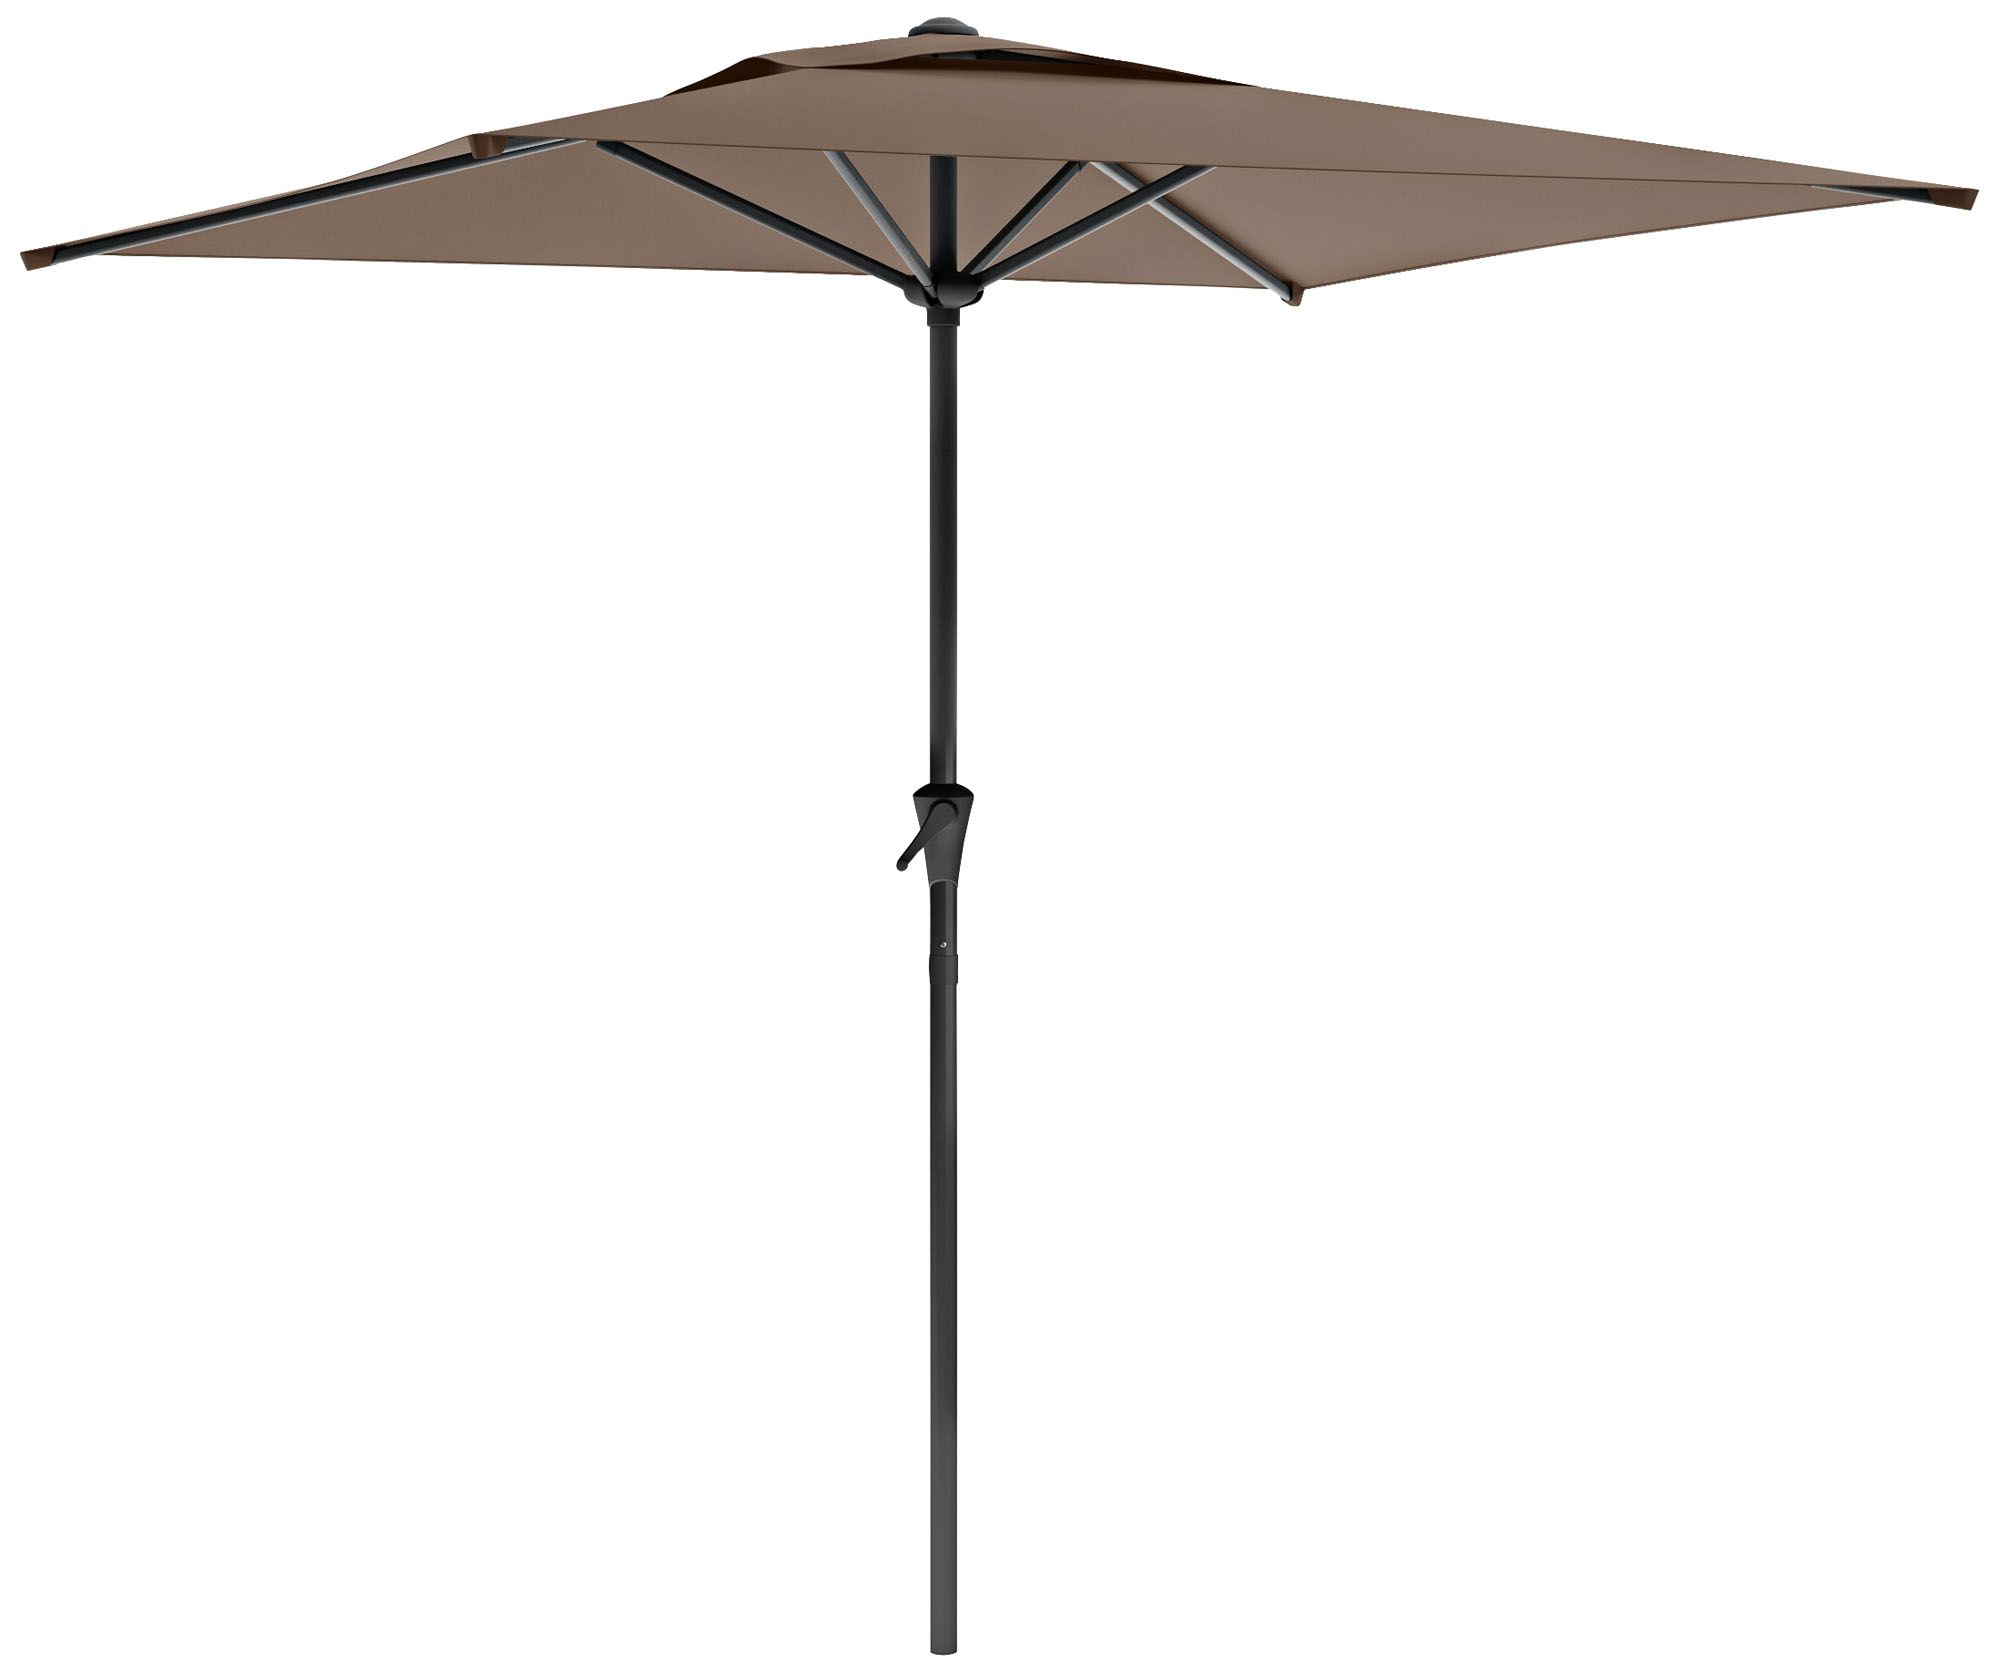 Shala 9 Foot Sandy Brown Tilting Square Patio Umbrella